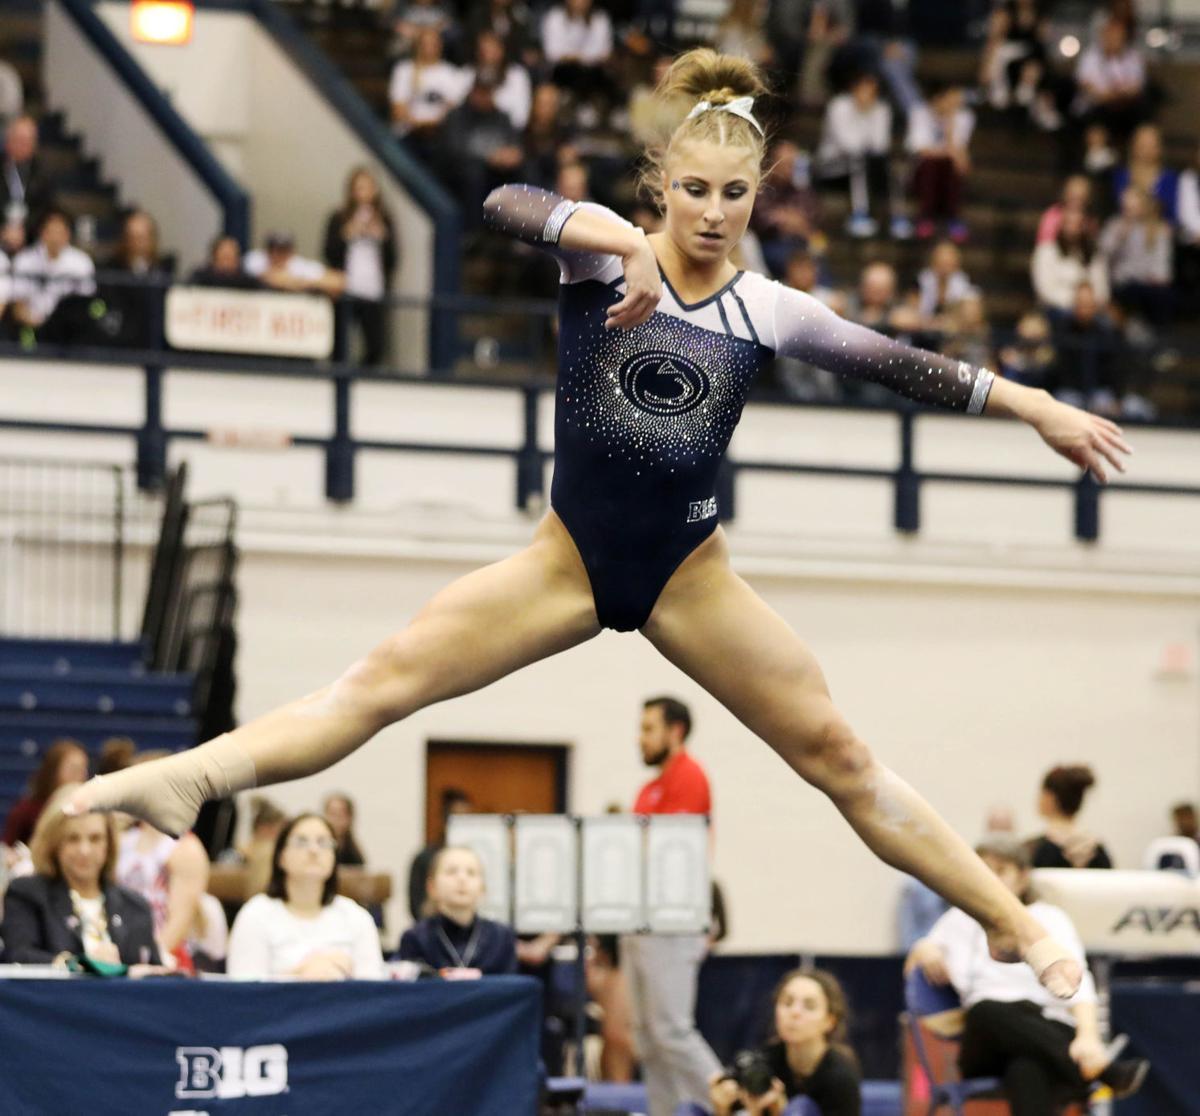 Women gymnastics photo 74